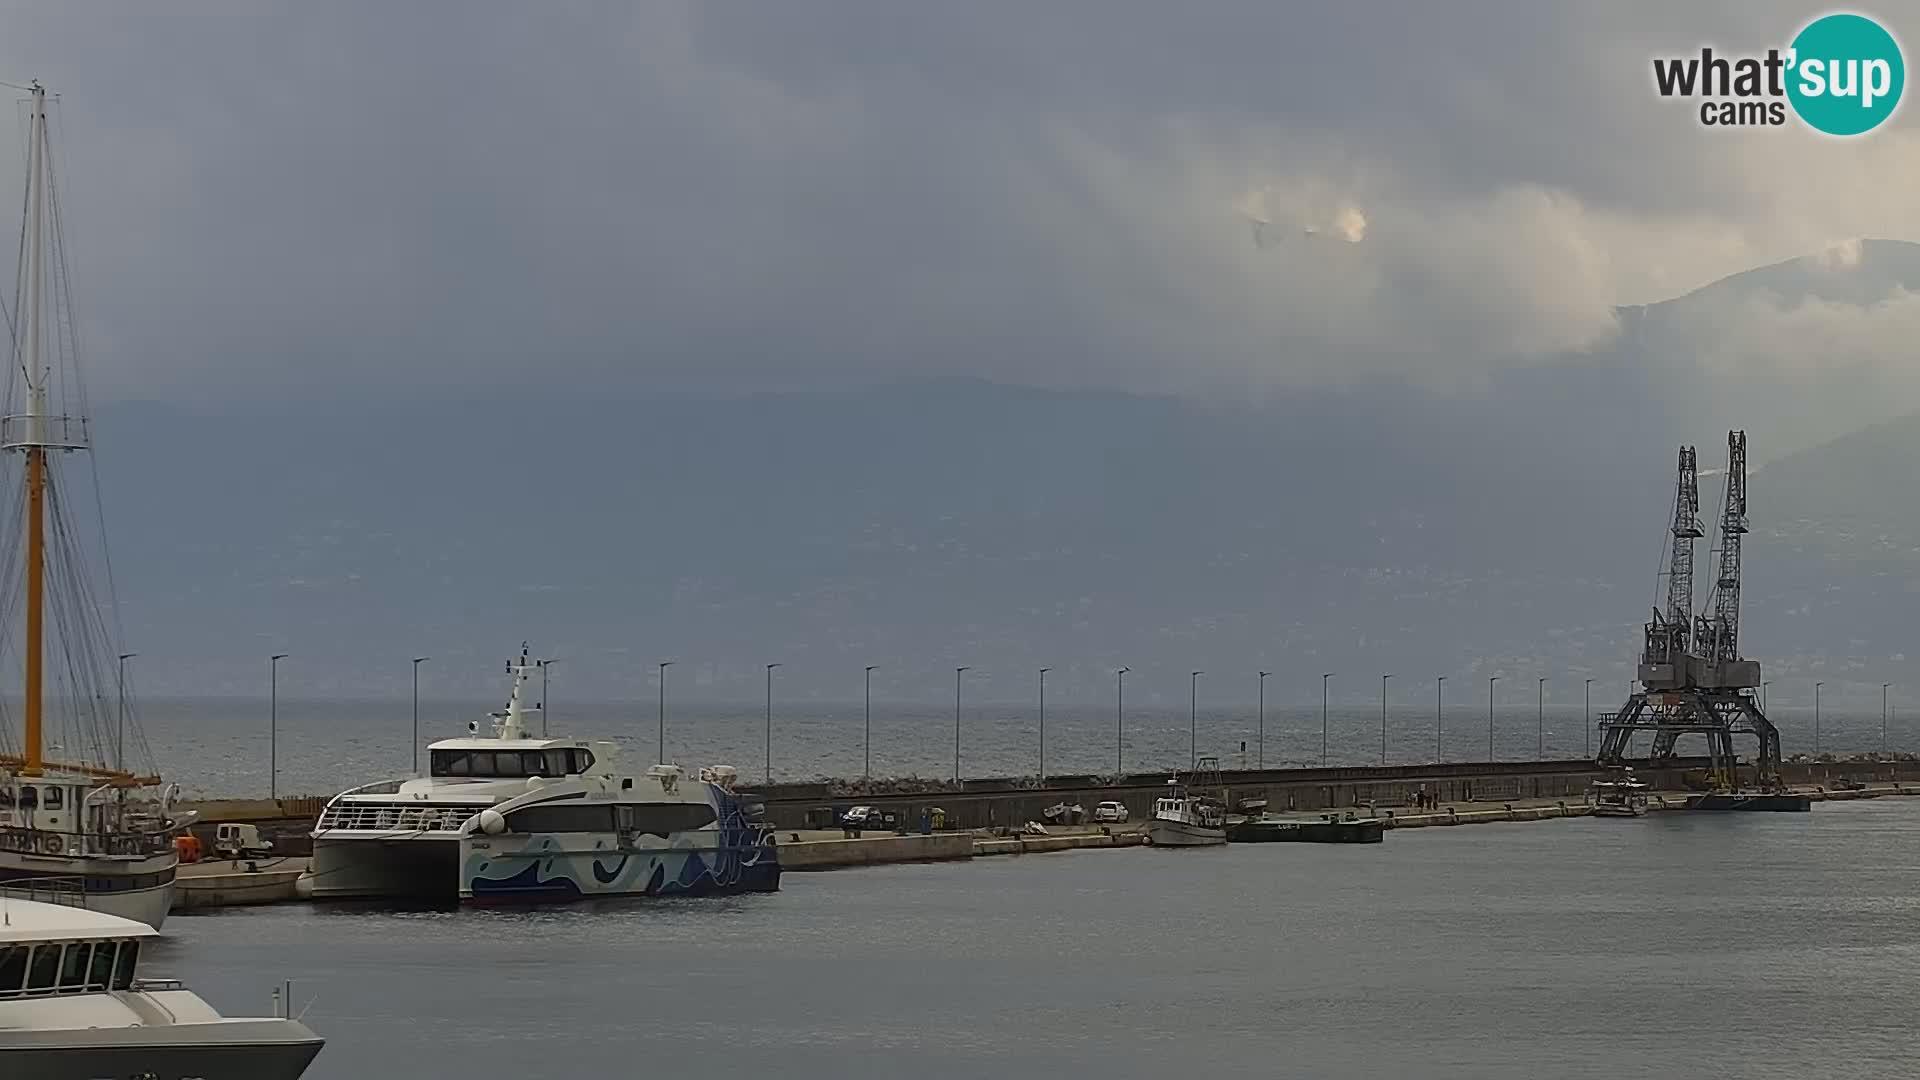 La Riva et Marina à Rijeka – Live Webcam Croatie